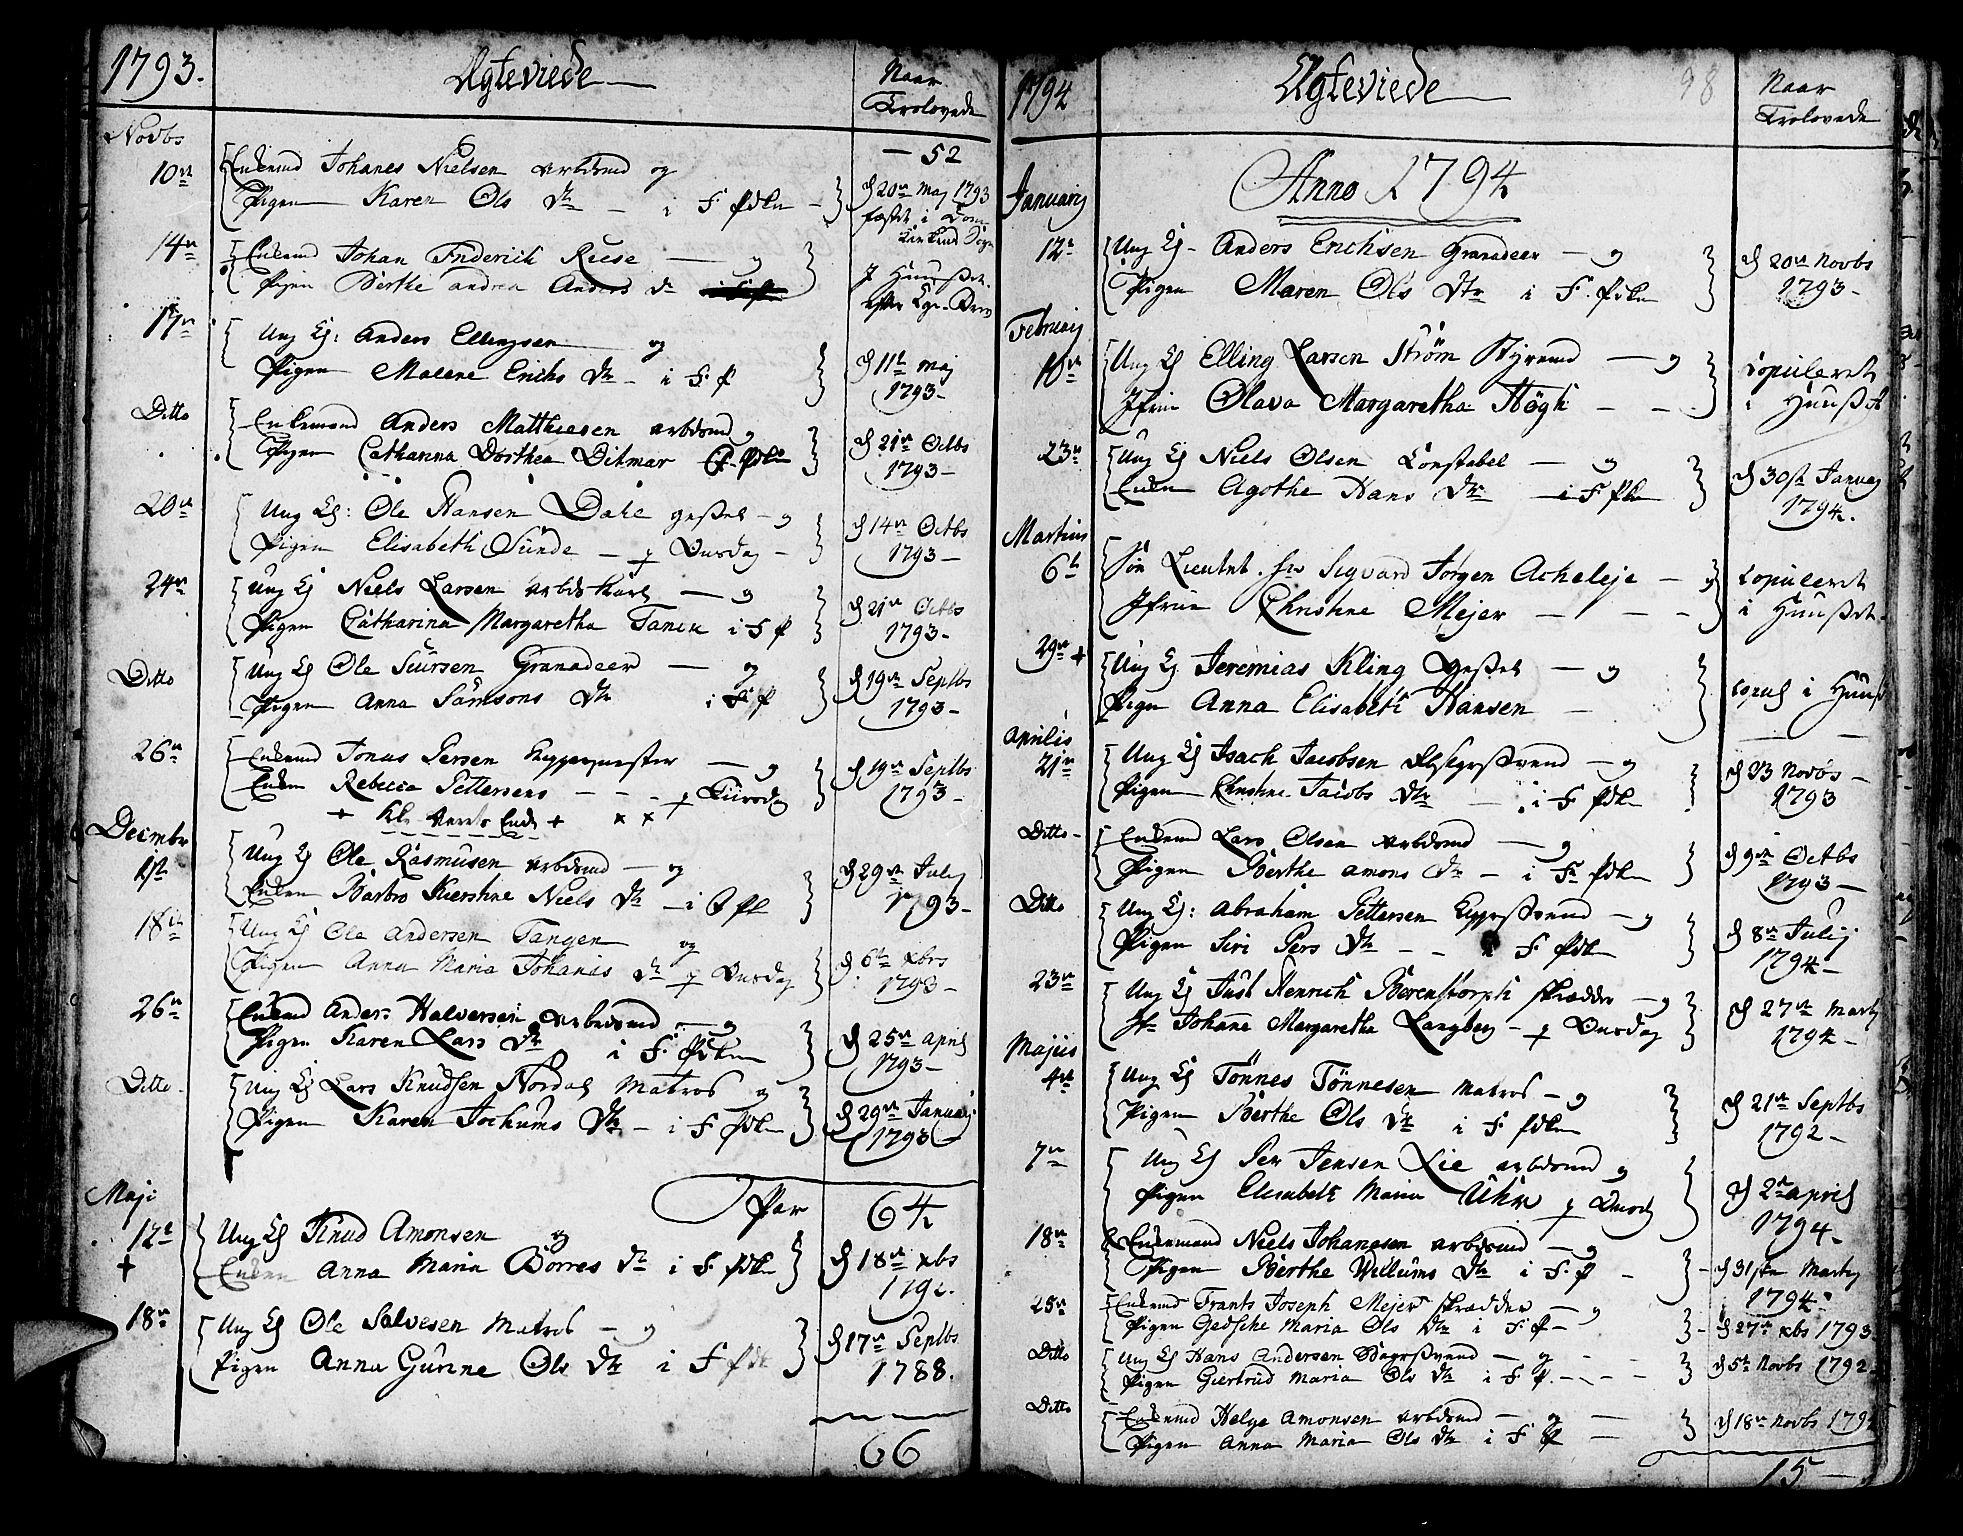 SAB, Korskirken Sokneprestembete, H/Haa/L0009: Parish register (official) no. A 9, 1743-1861, p. 98